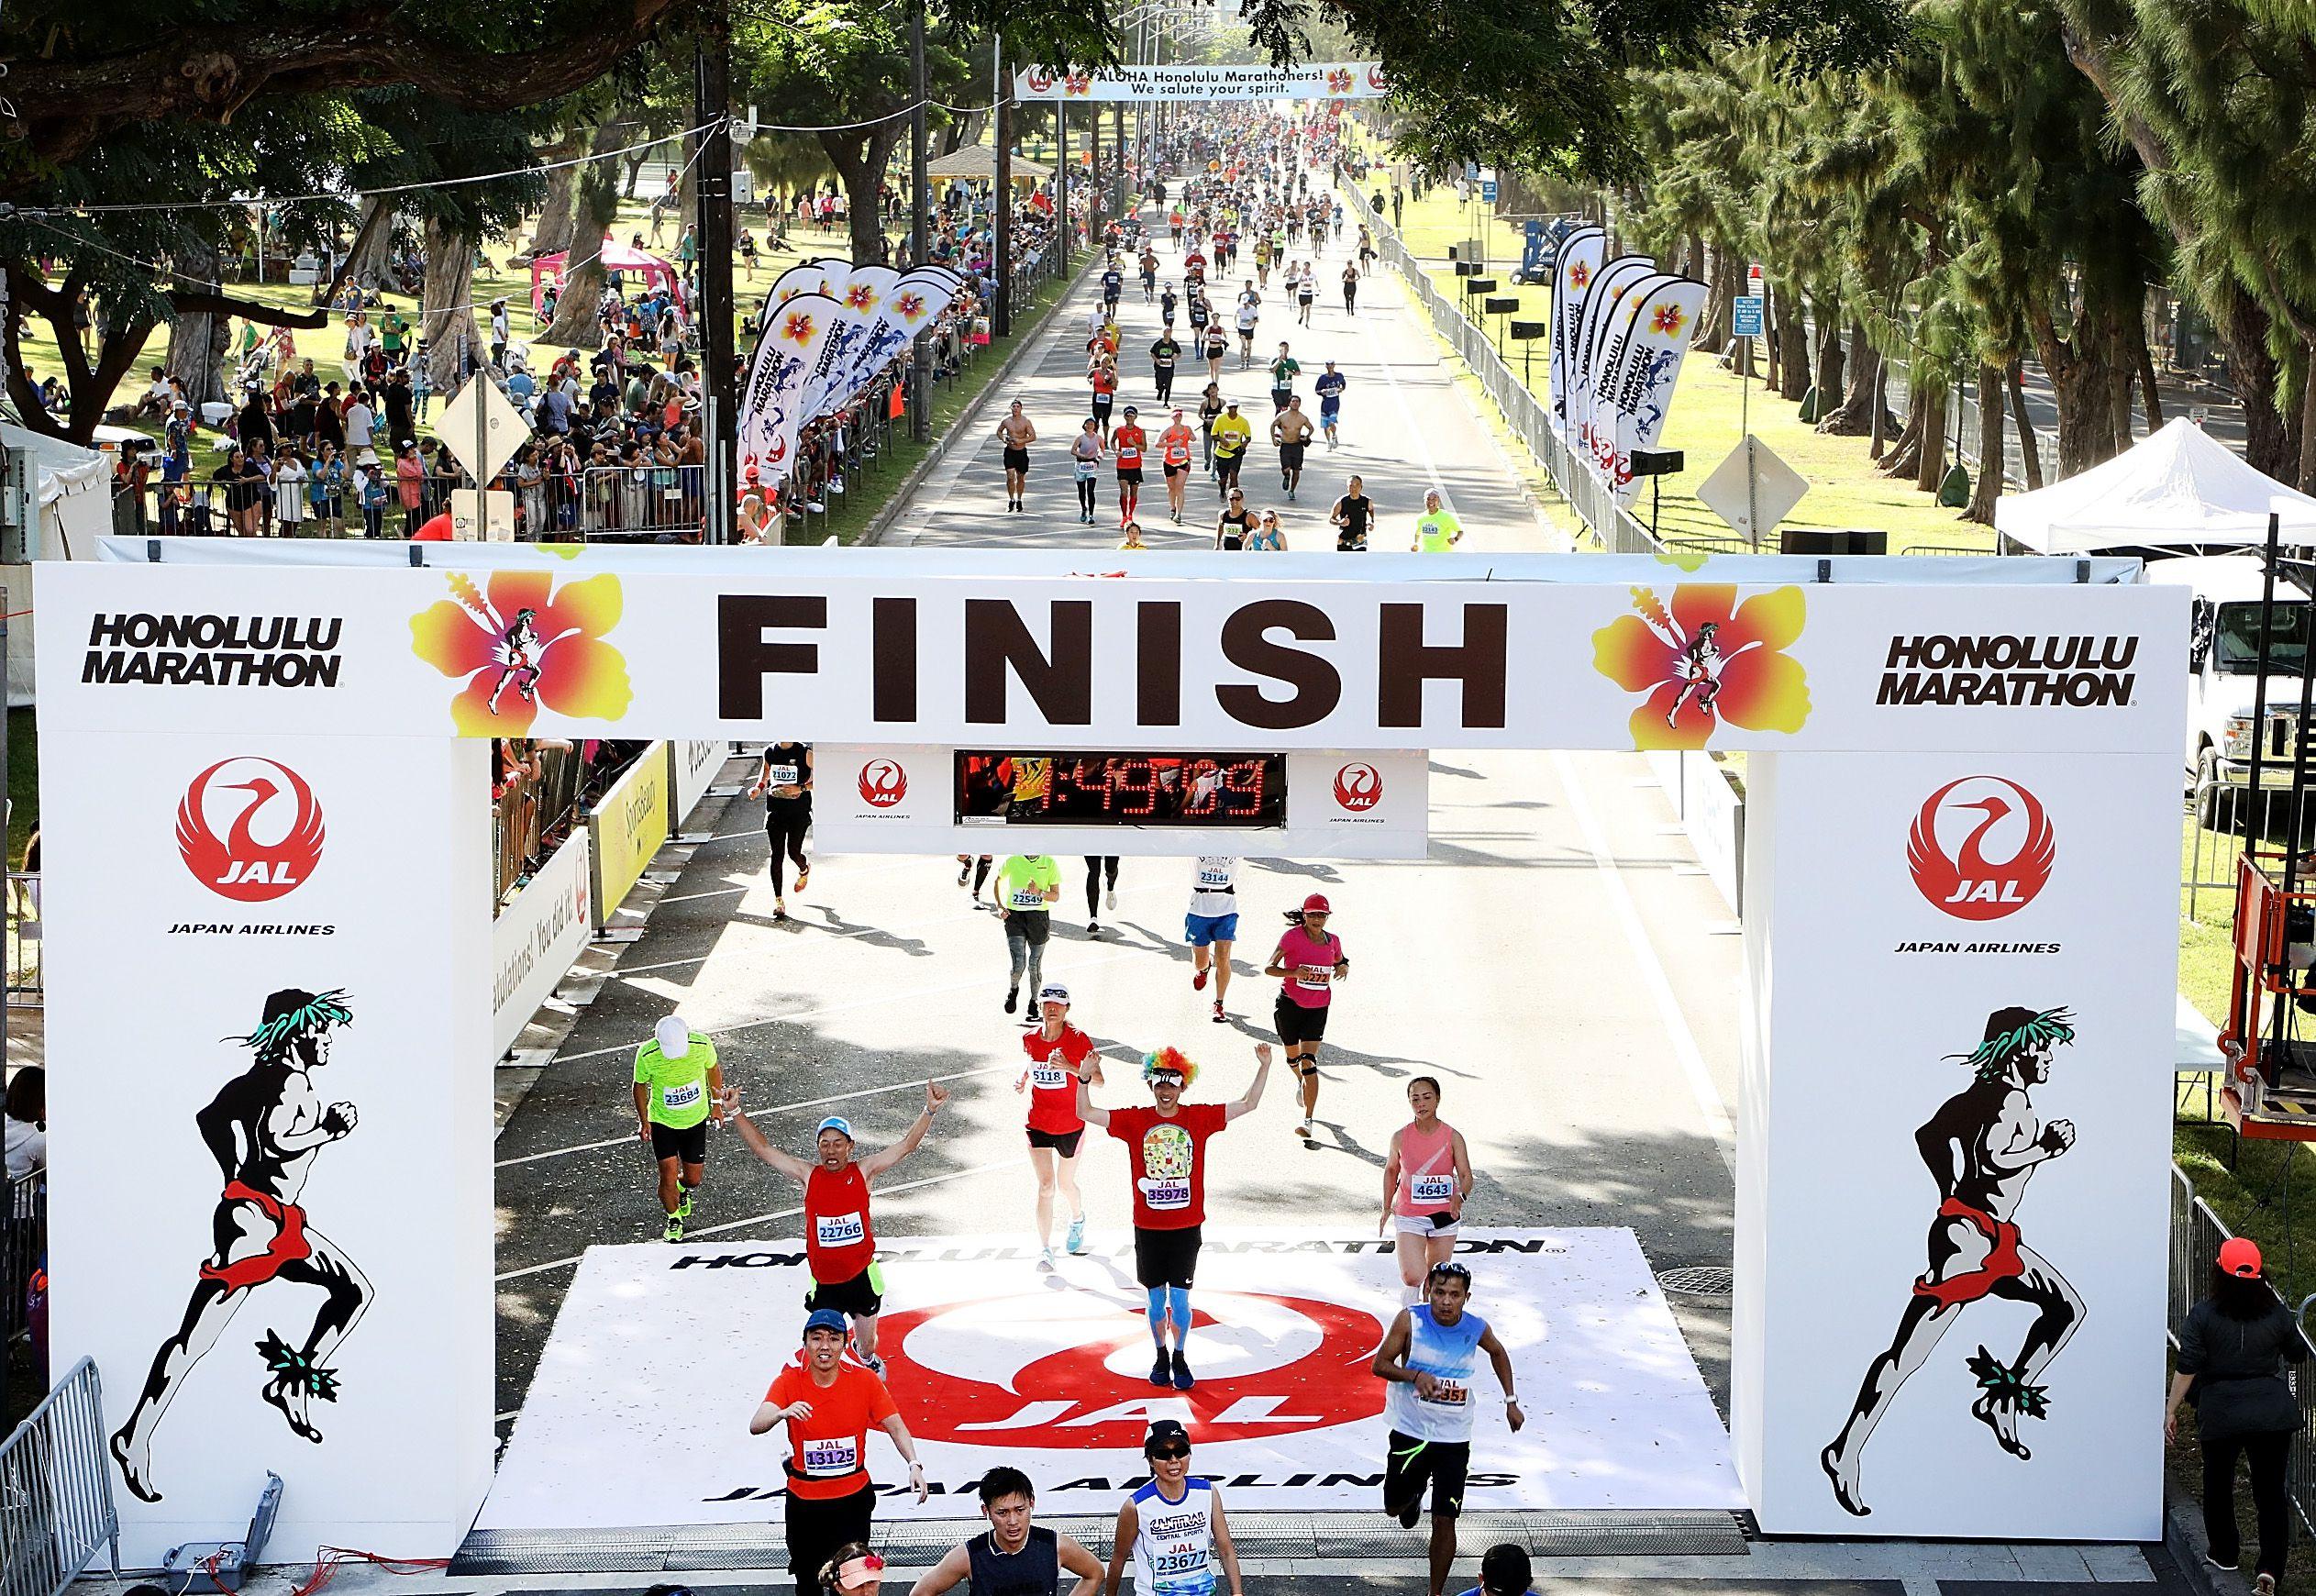 Línea de meta del maratón de Honolulu